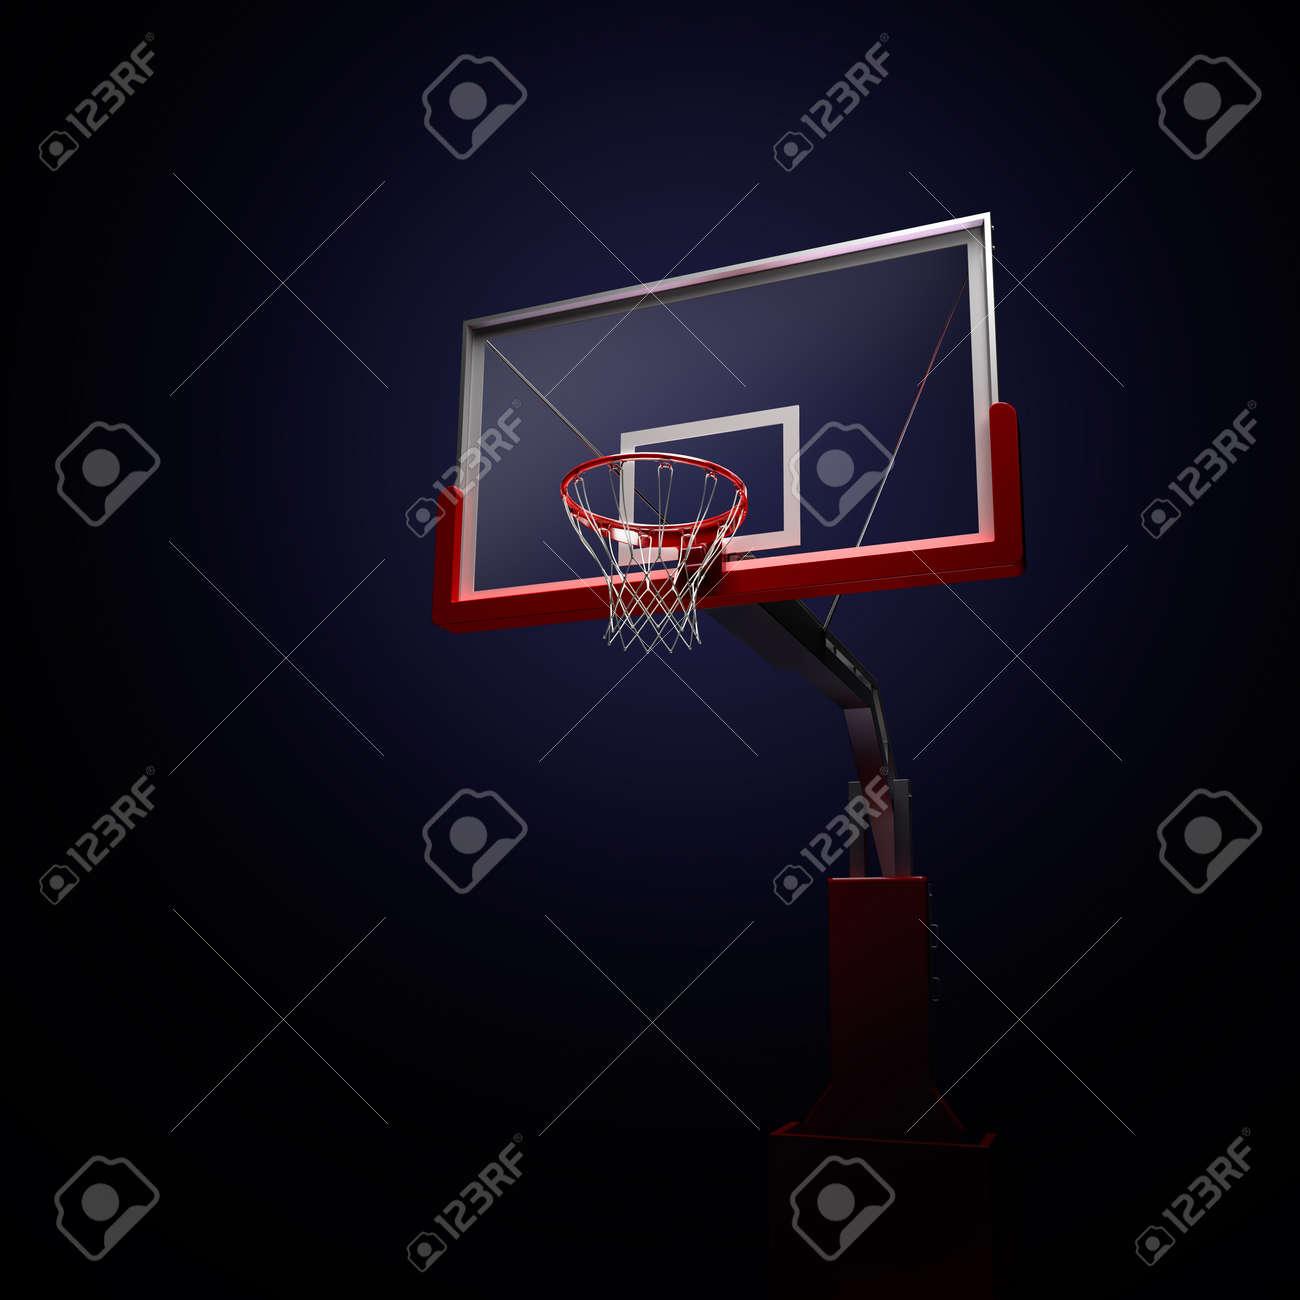 Red basketball houp in red . 3d render illustration on black background - 46314884